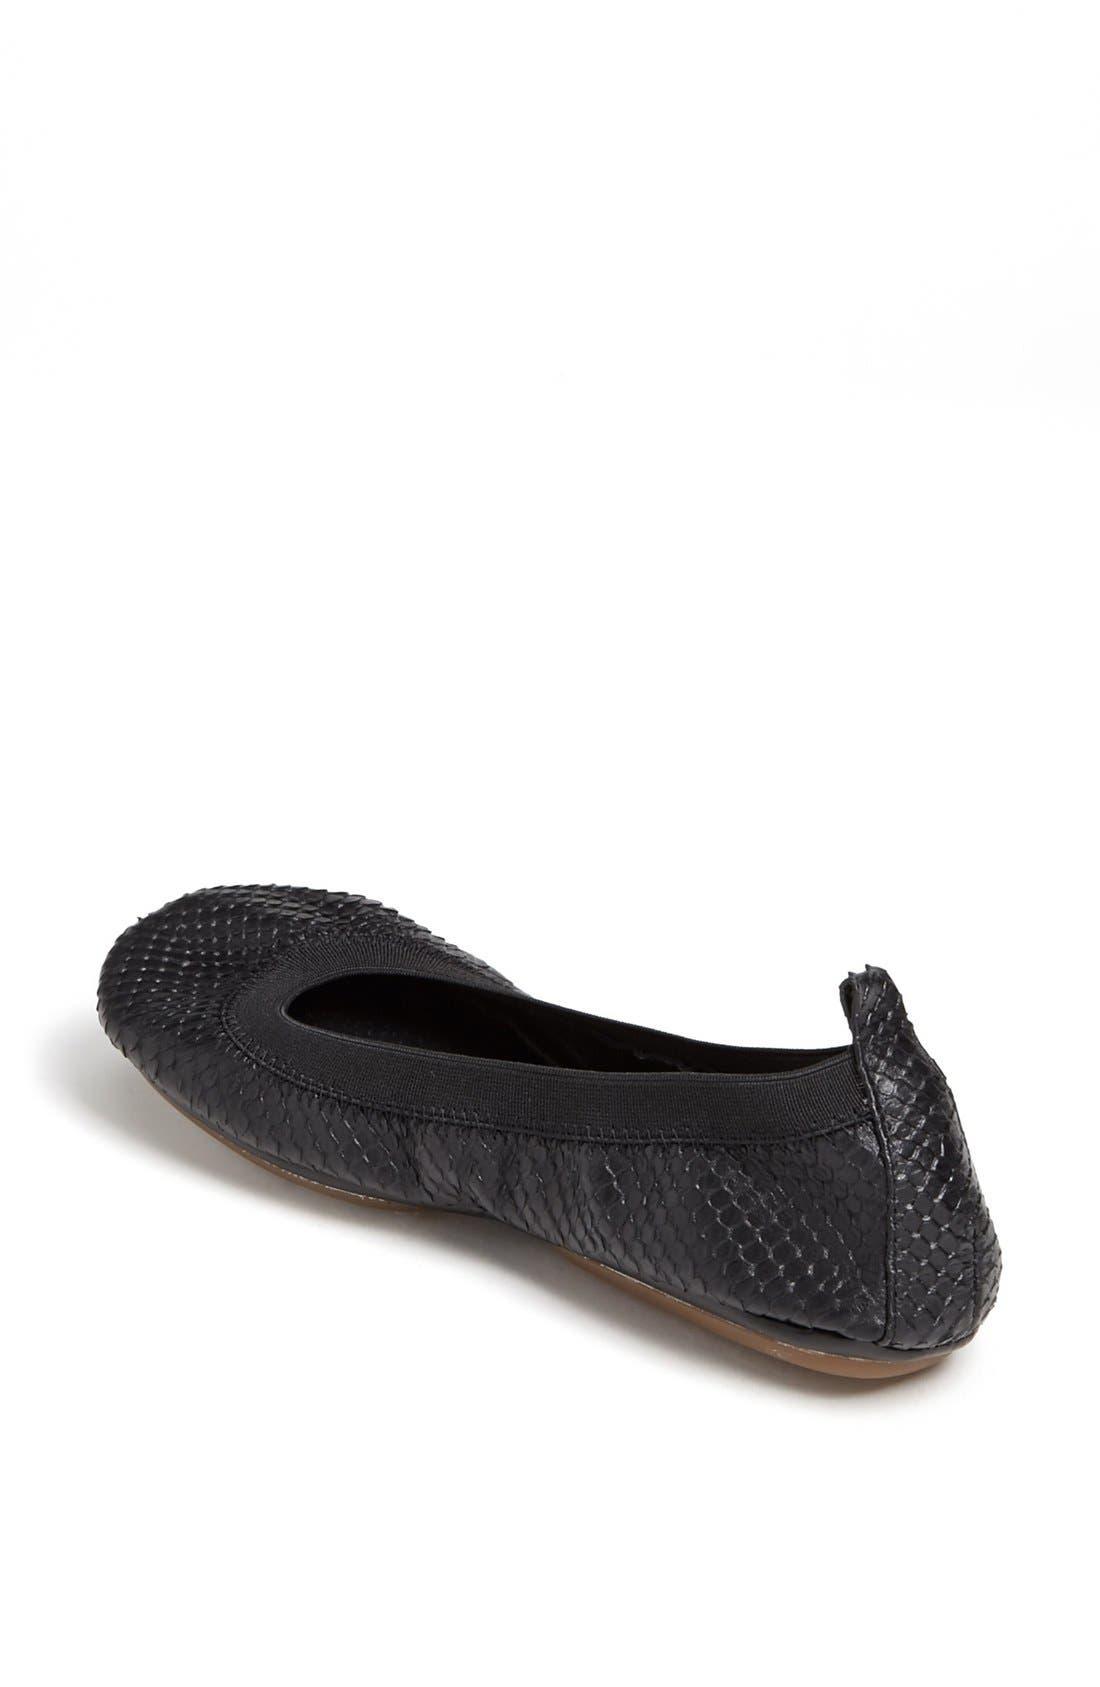 Alternate Image 2  - Yosi Samra Croc Embossed Foldable Ballet Flat